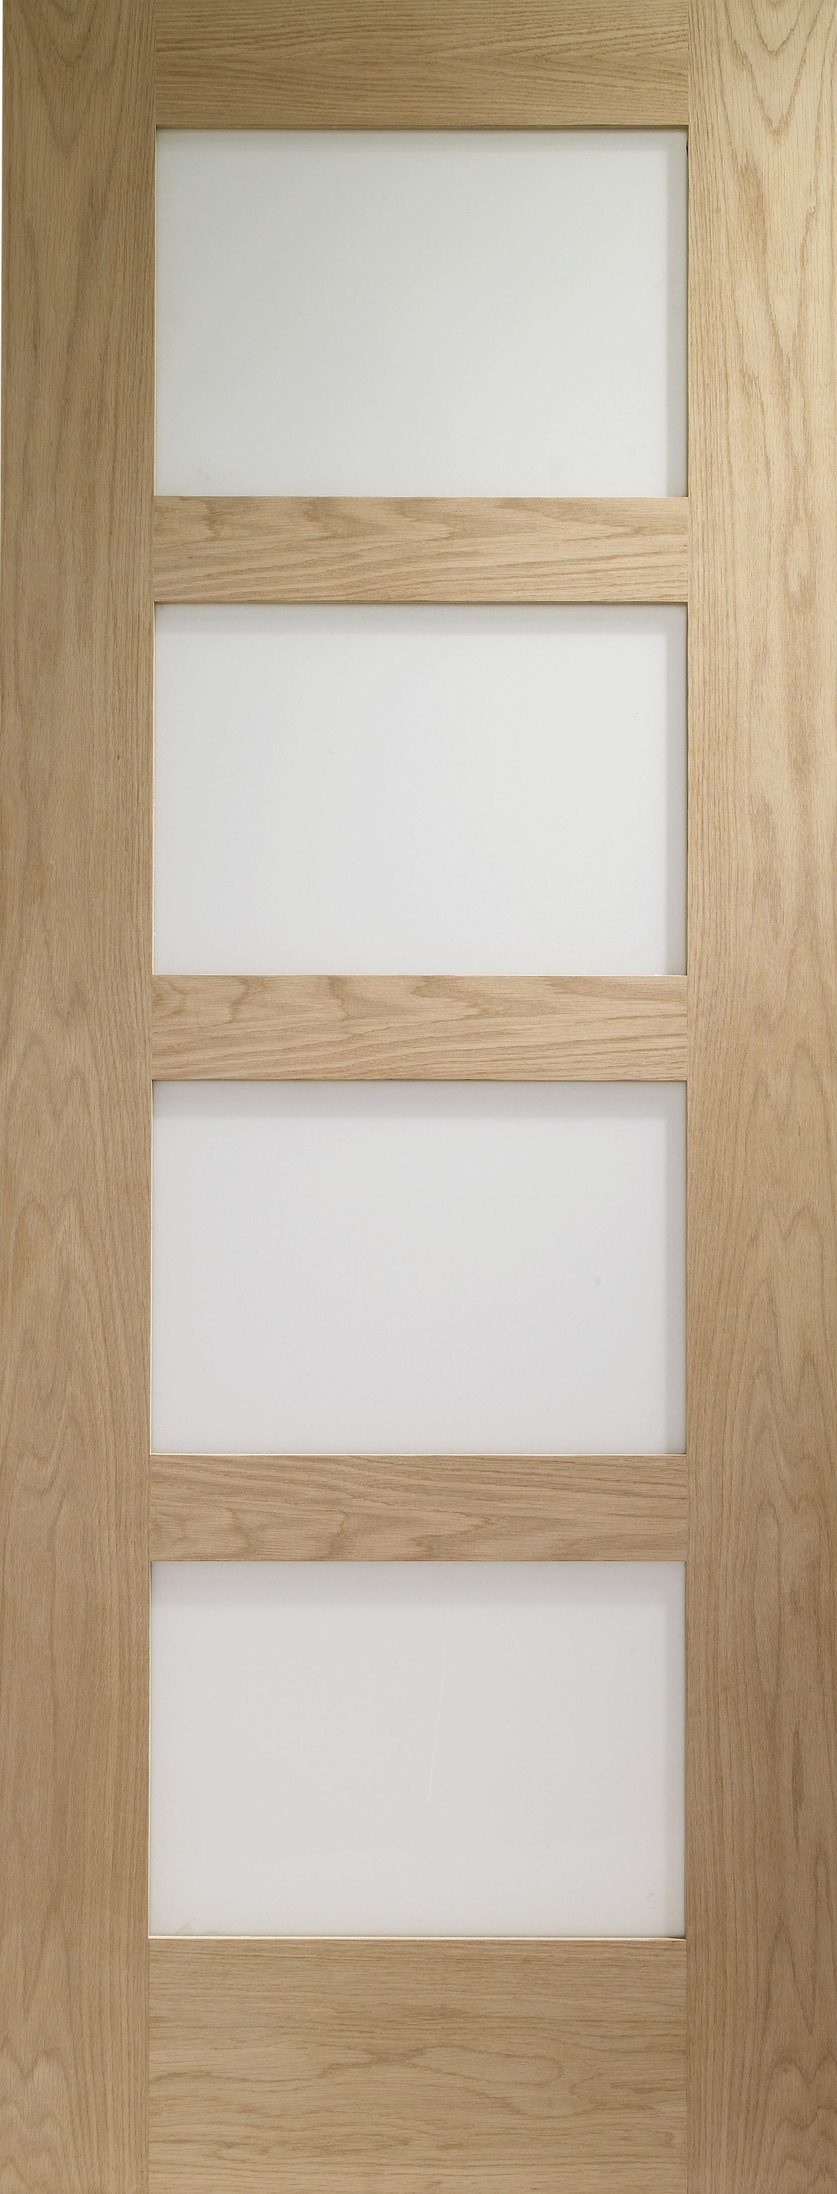 Red oak doors whitelaminatedglass4 paneloakdoor eventelaan Choice Image